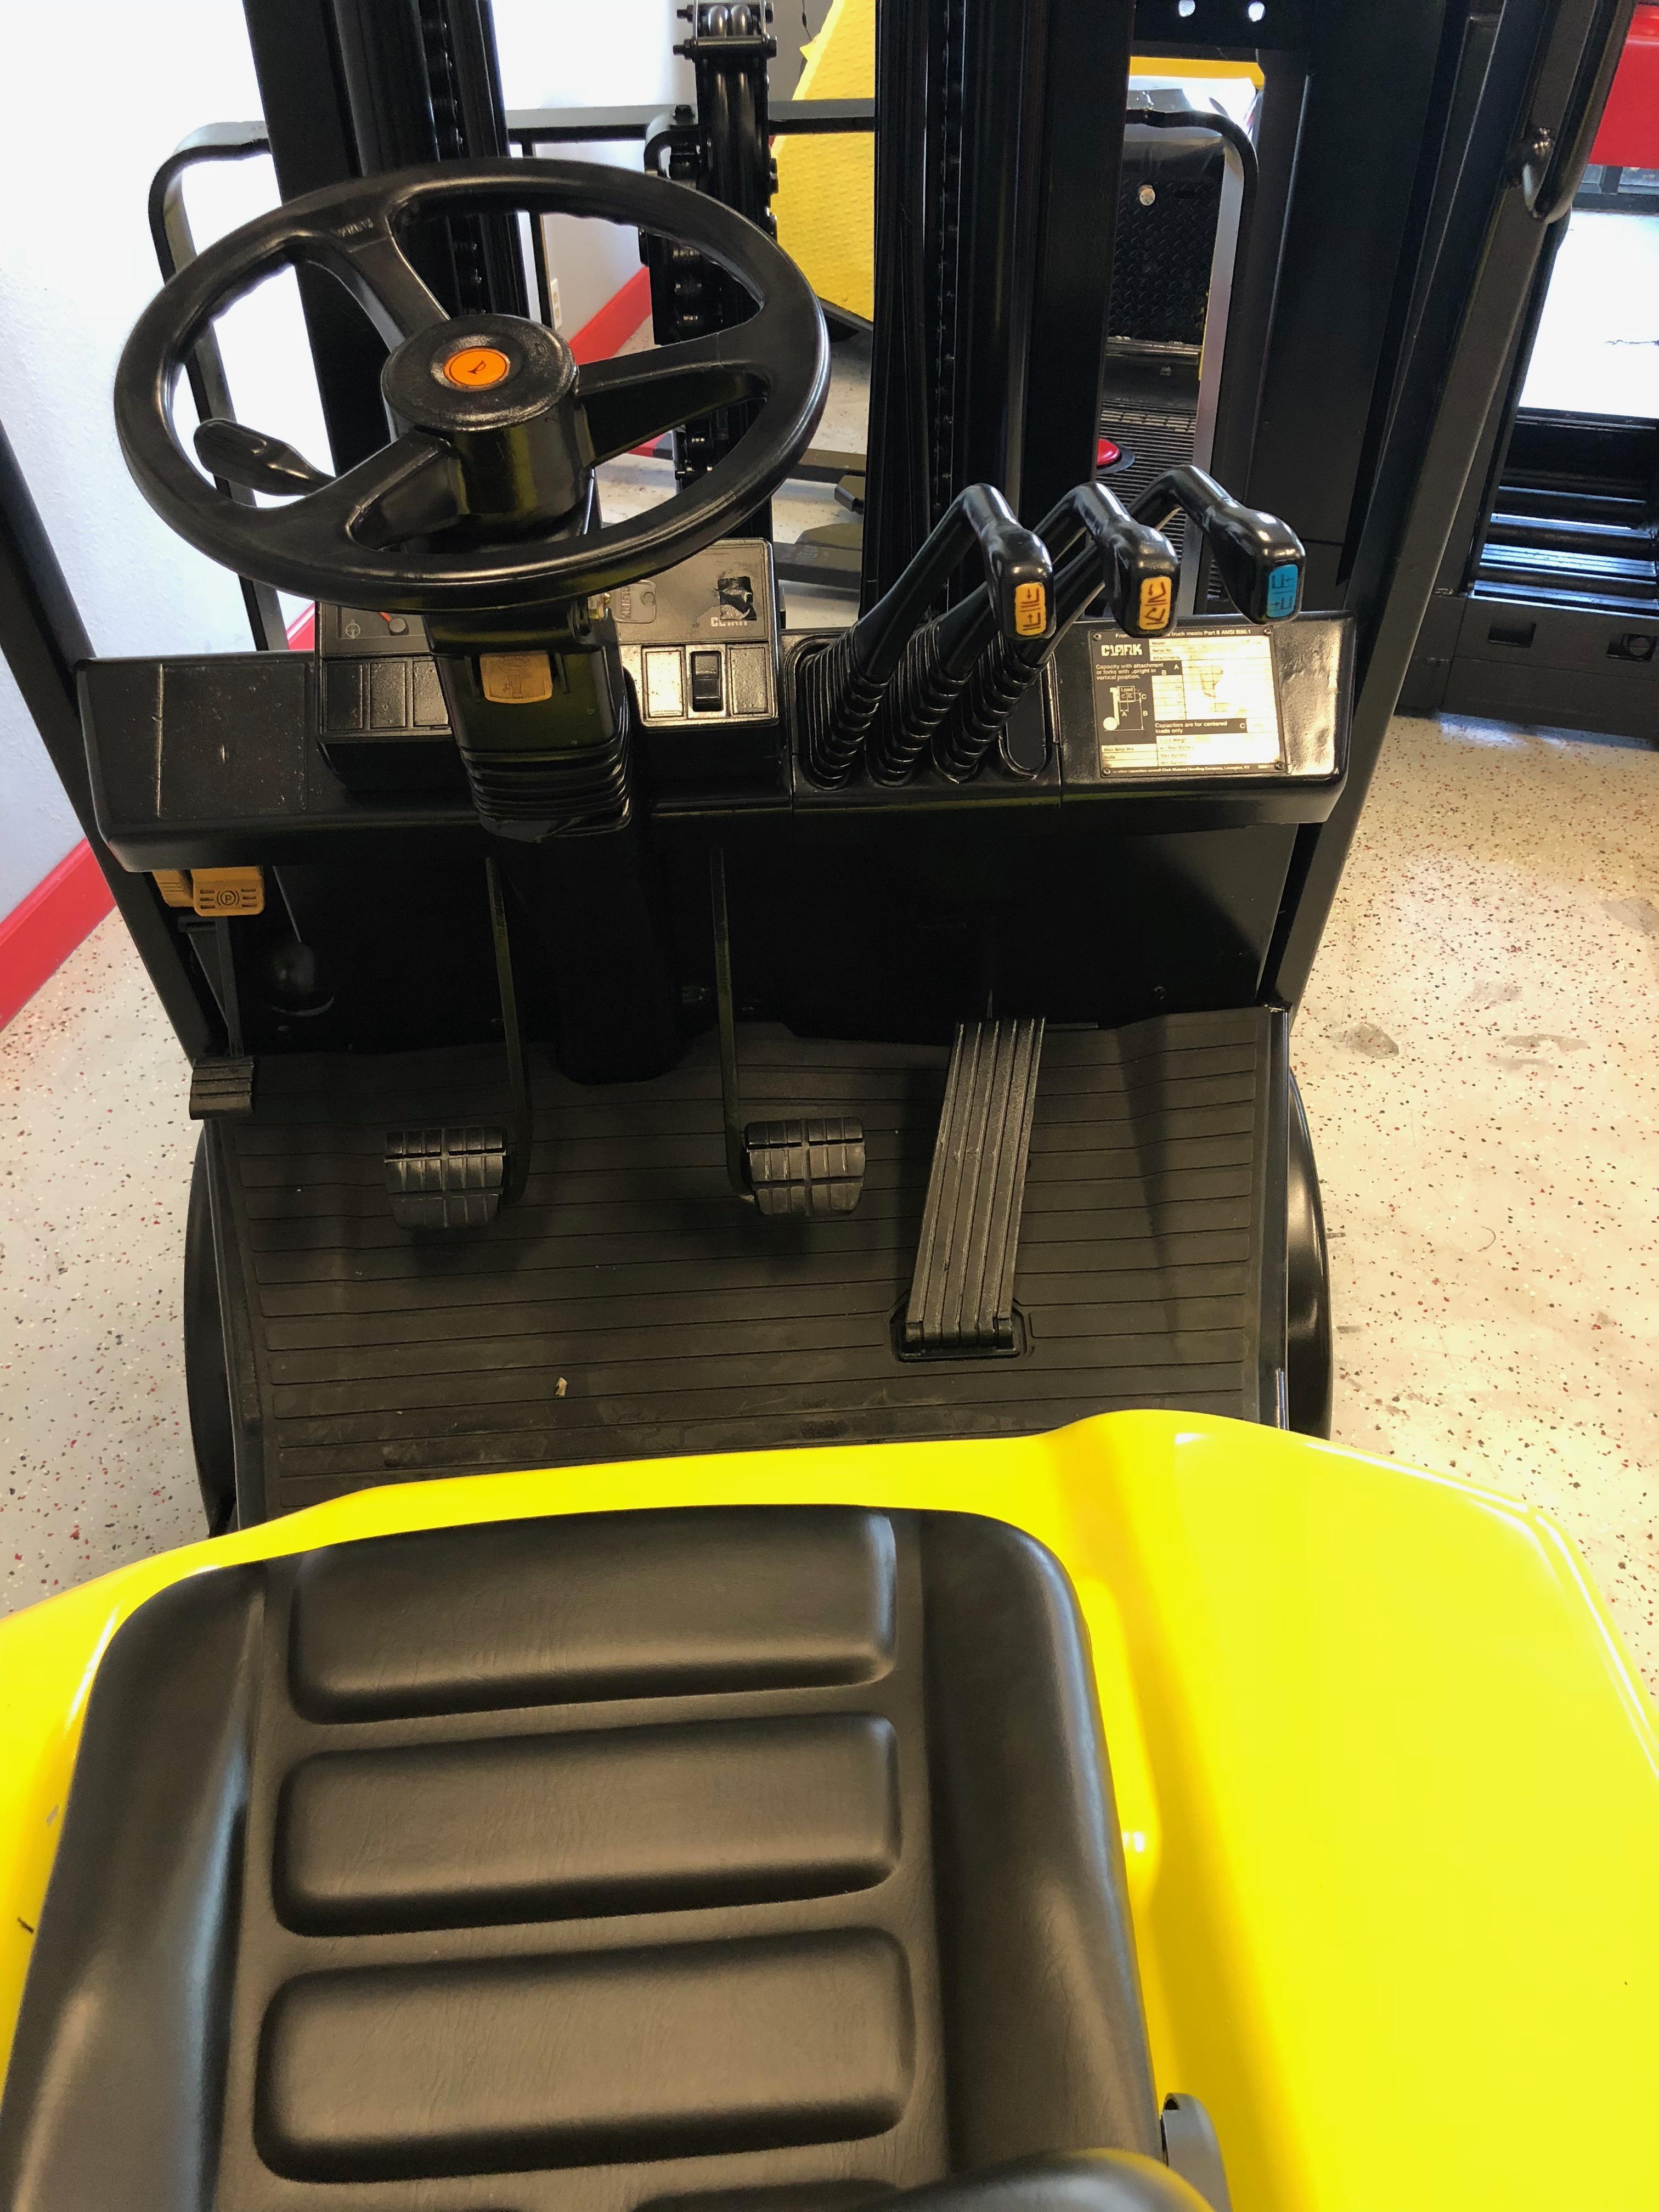 20794 Clark C25 5,000 lbs  Propane Forklift - Coronado